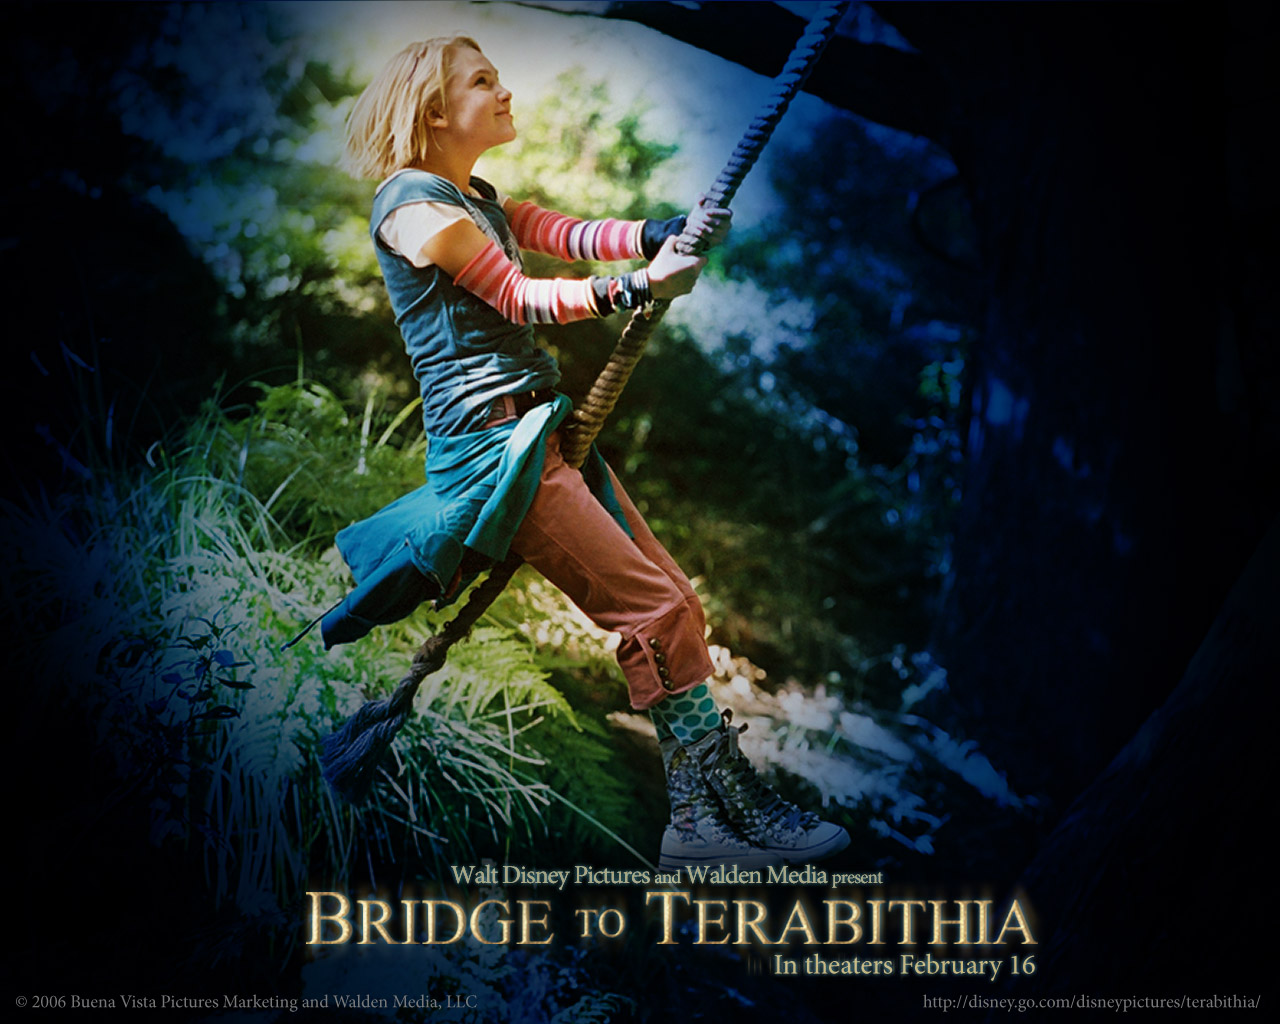 Wallpaper bridge to terabithia 135288 1280 1024